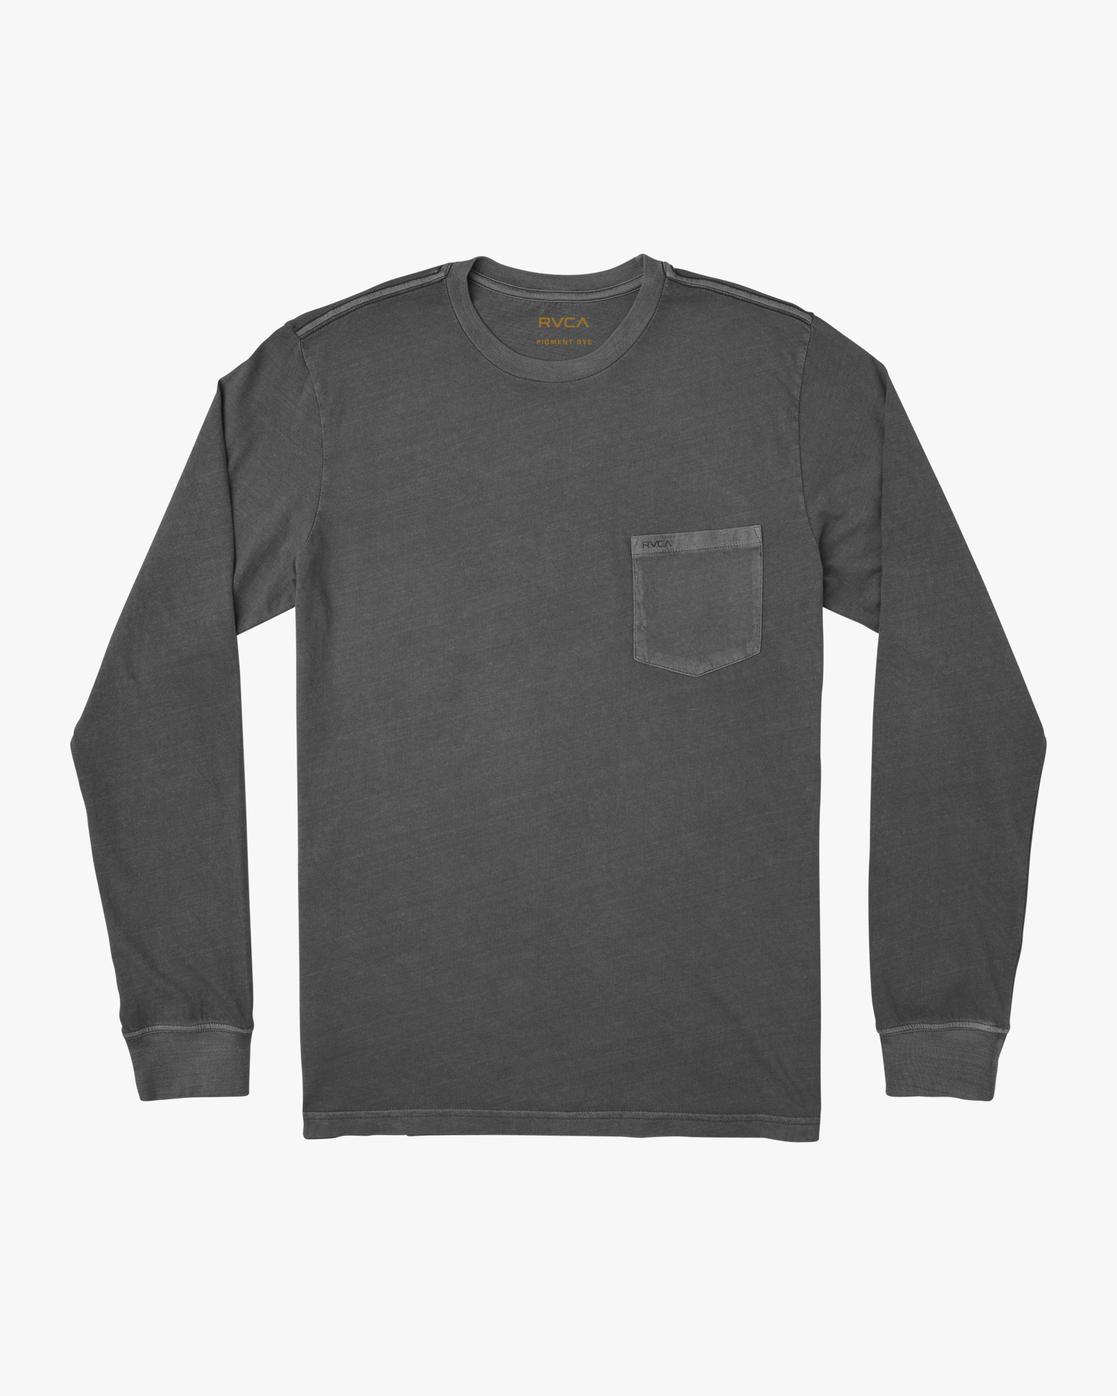 0 PTC Pigment  - Camiseta de manga larga para Hombre Negro Q1KTRPRVF9 RVCA